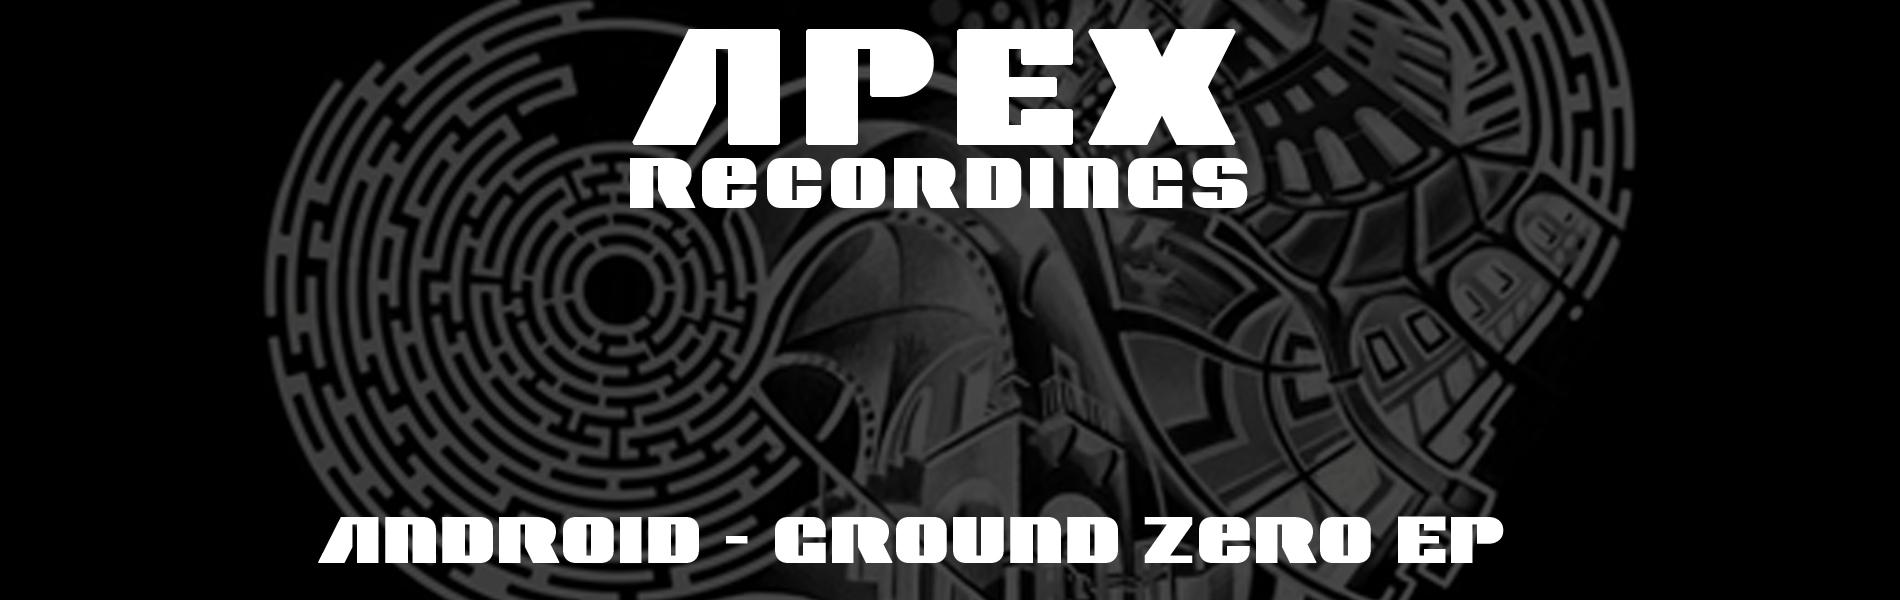 Apex-20-Slide